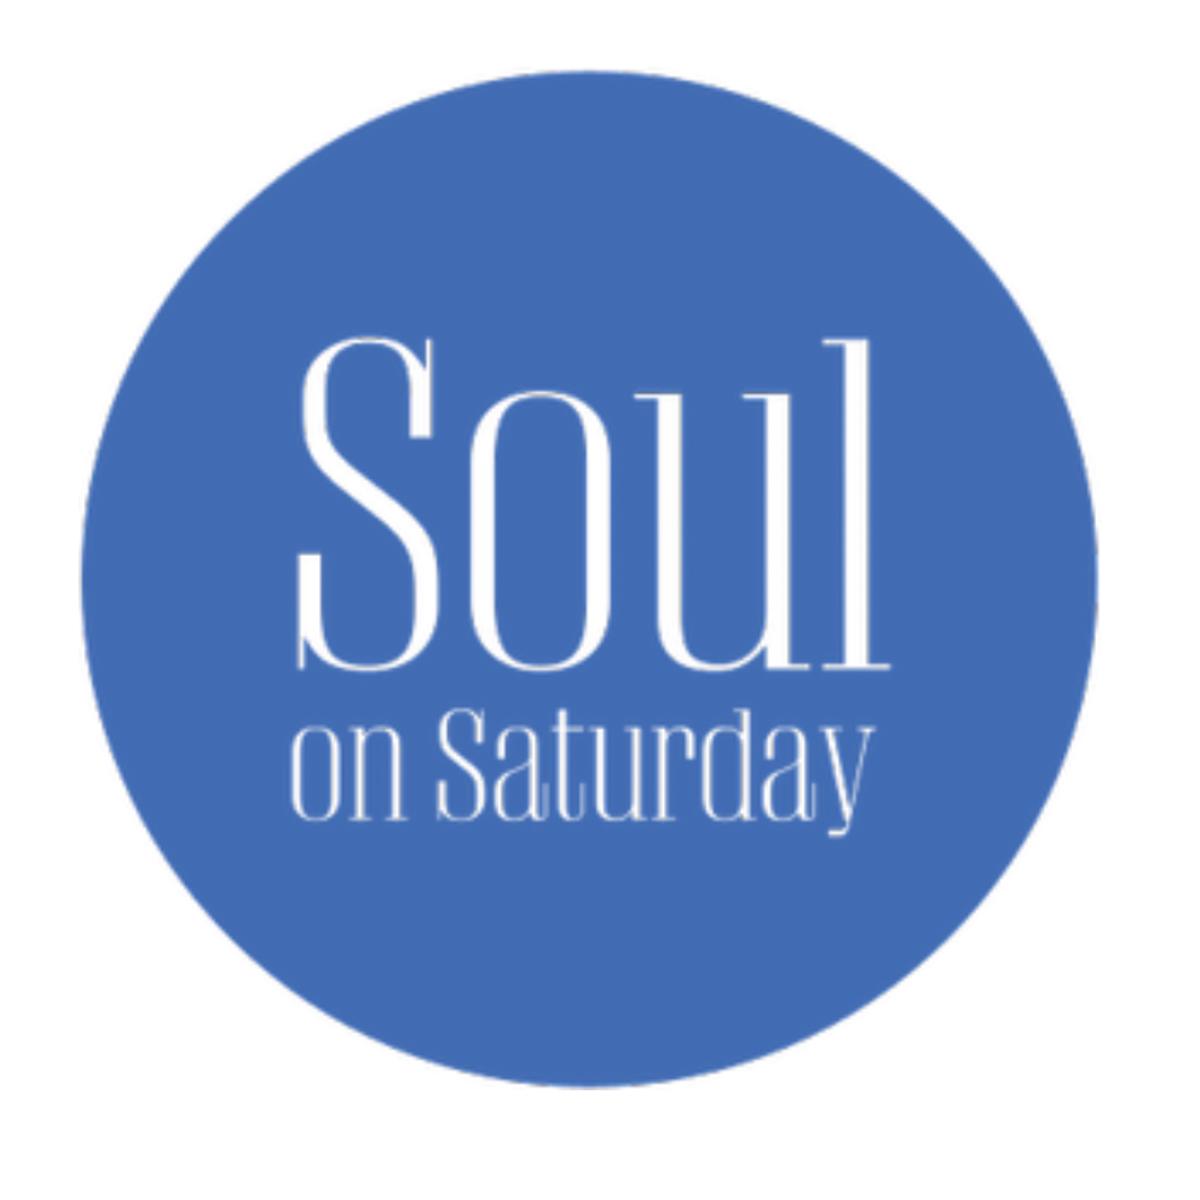 Soul on Saturday